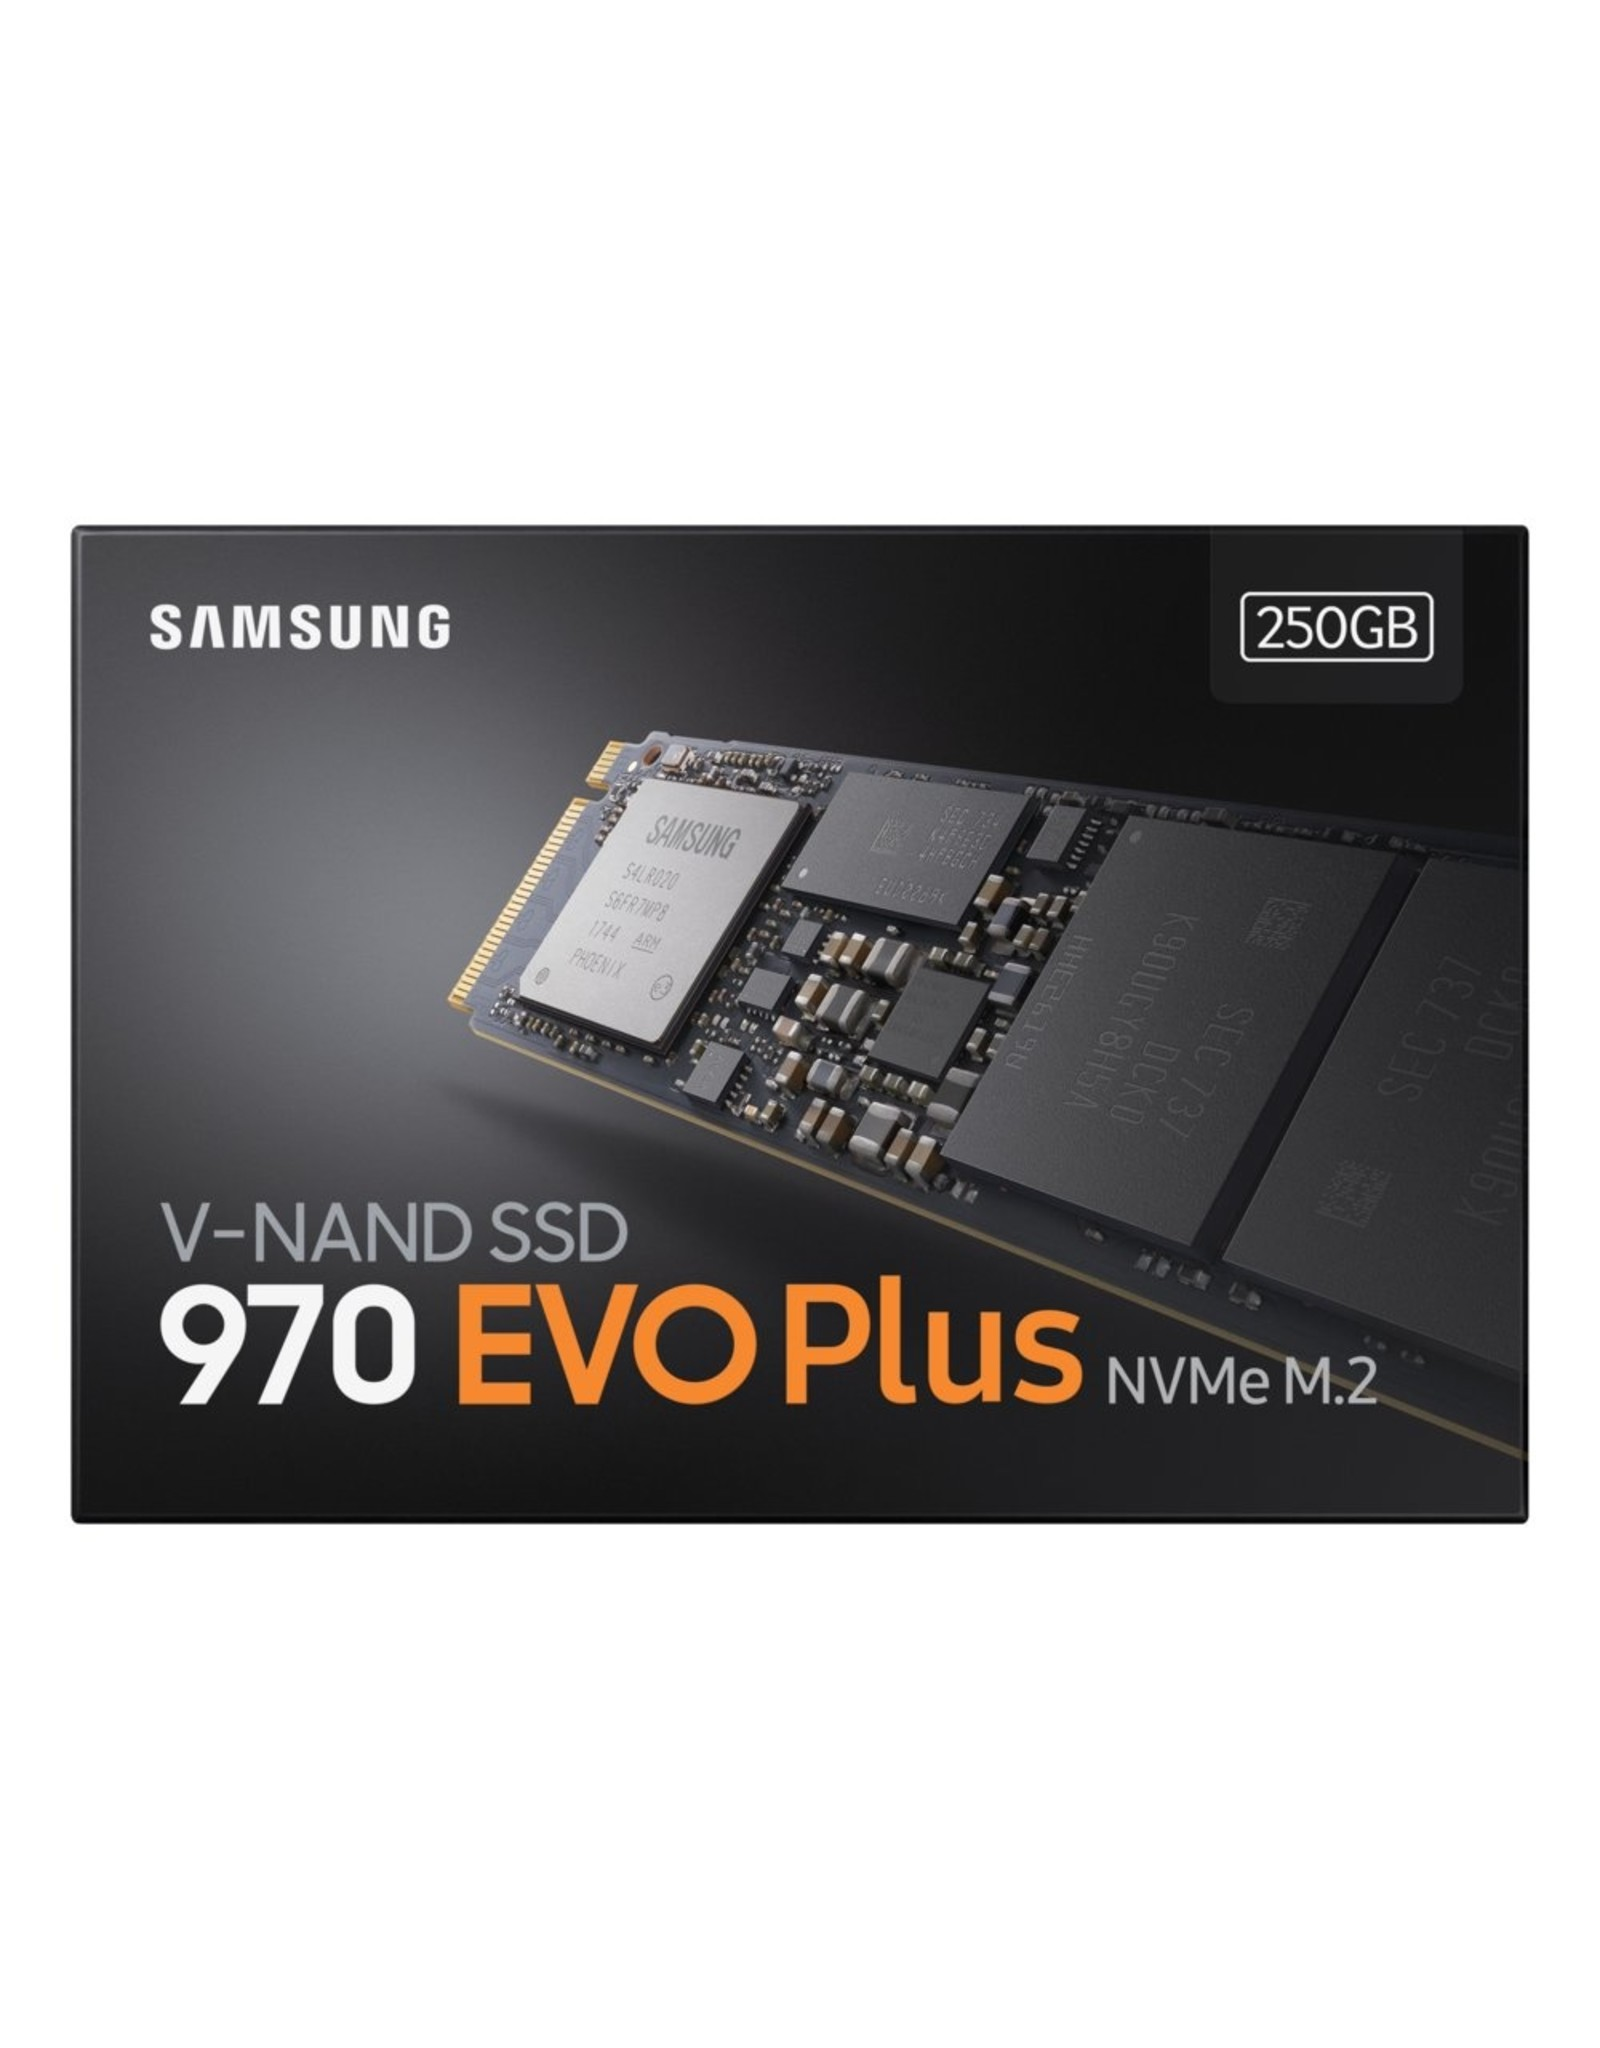 Samsung SSD  970 Evo Plus 250GB NVME M.2  3500MB/s / 2300MB/s